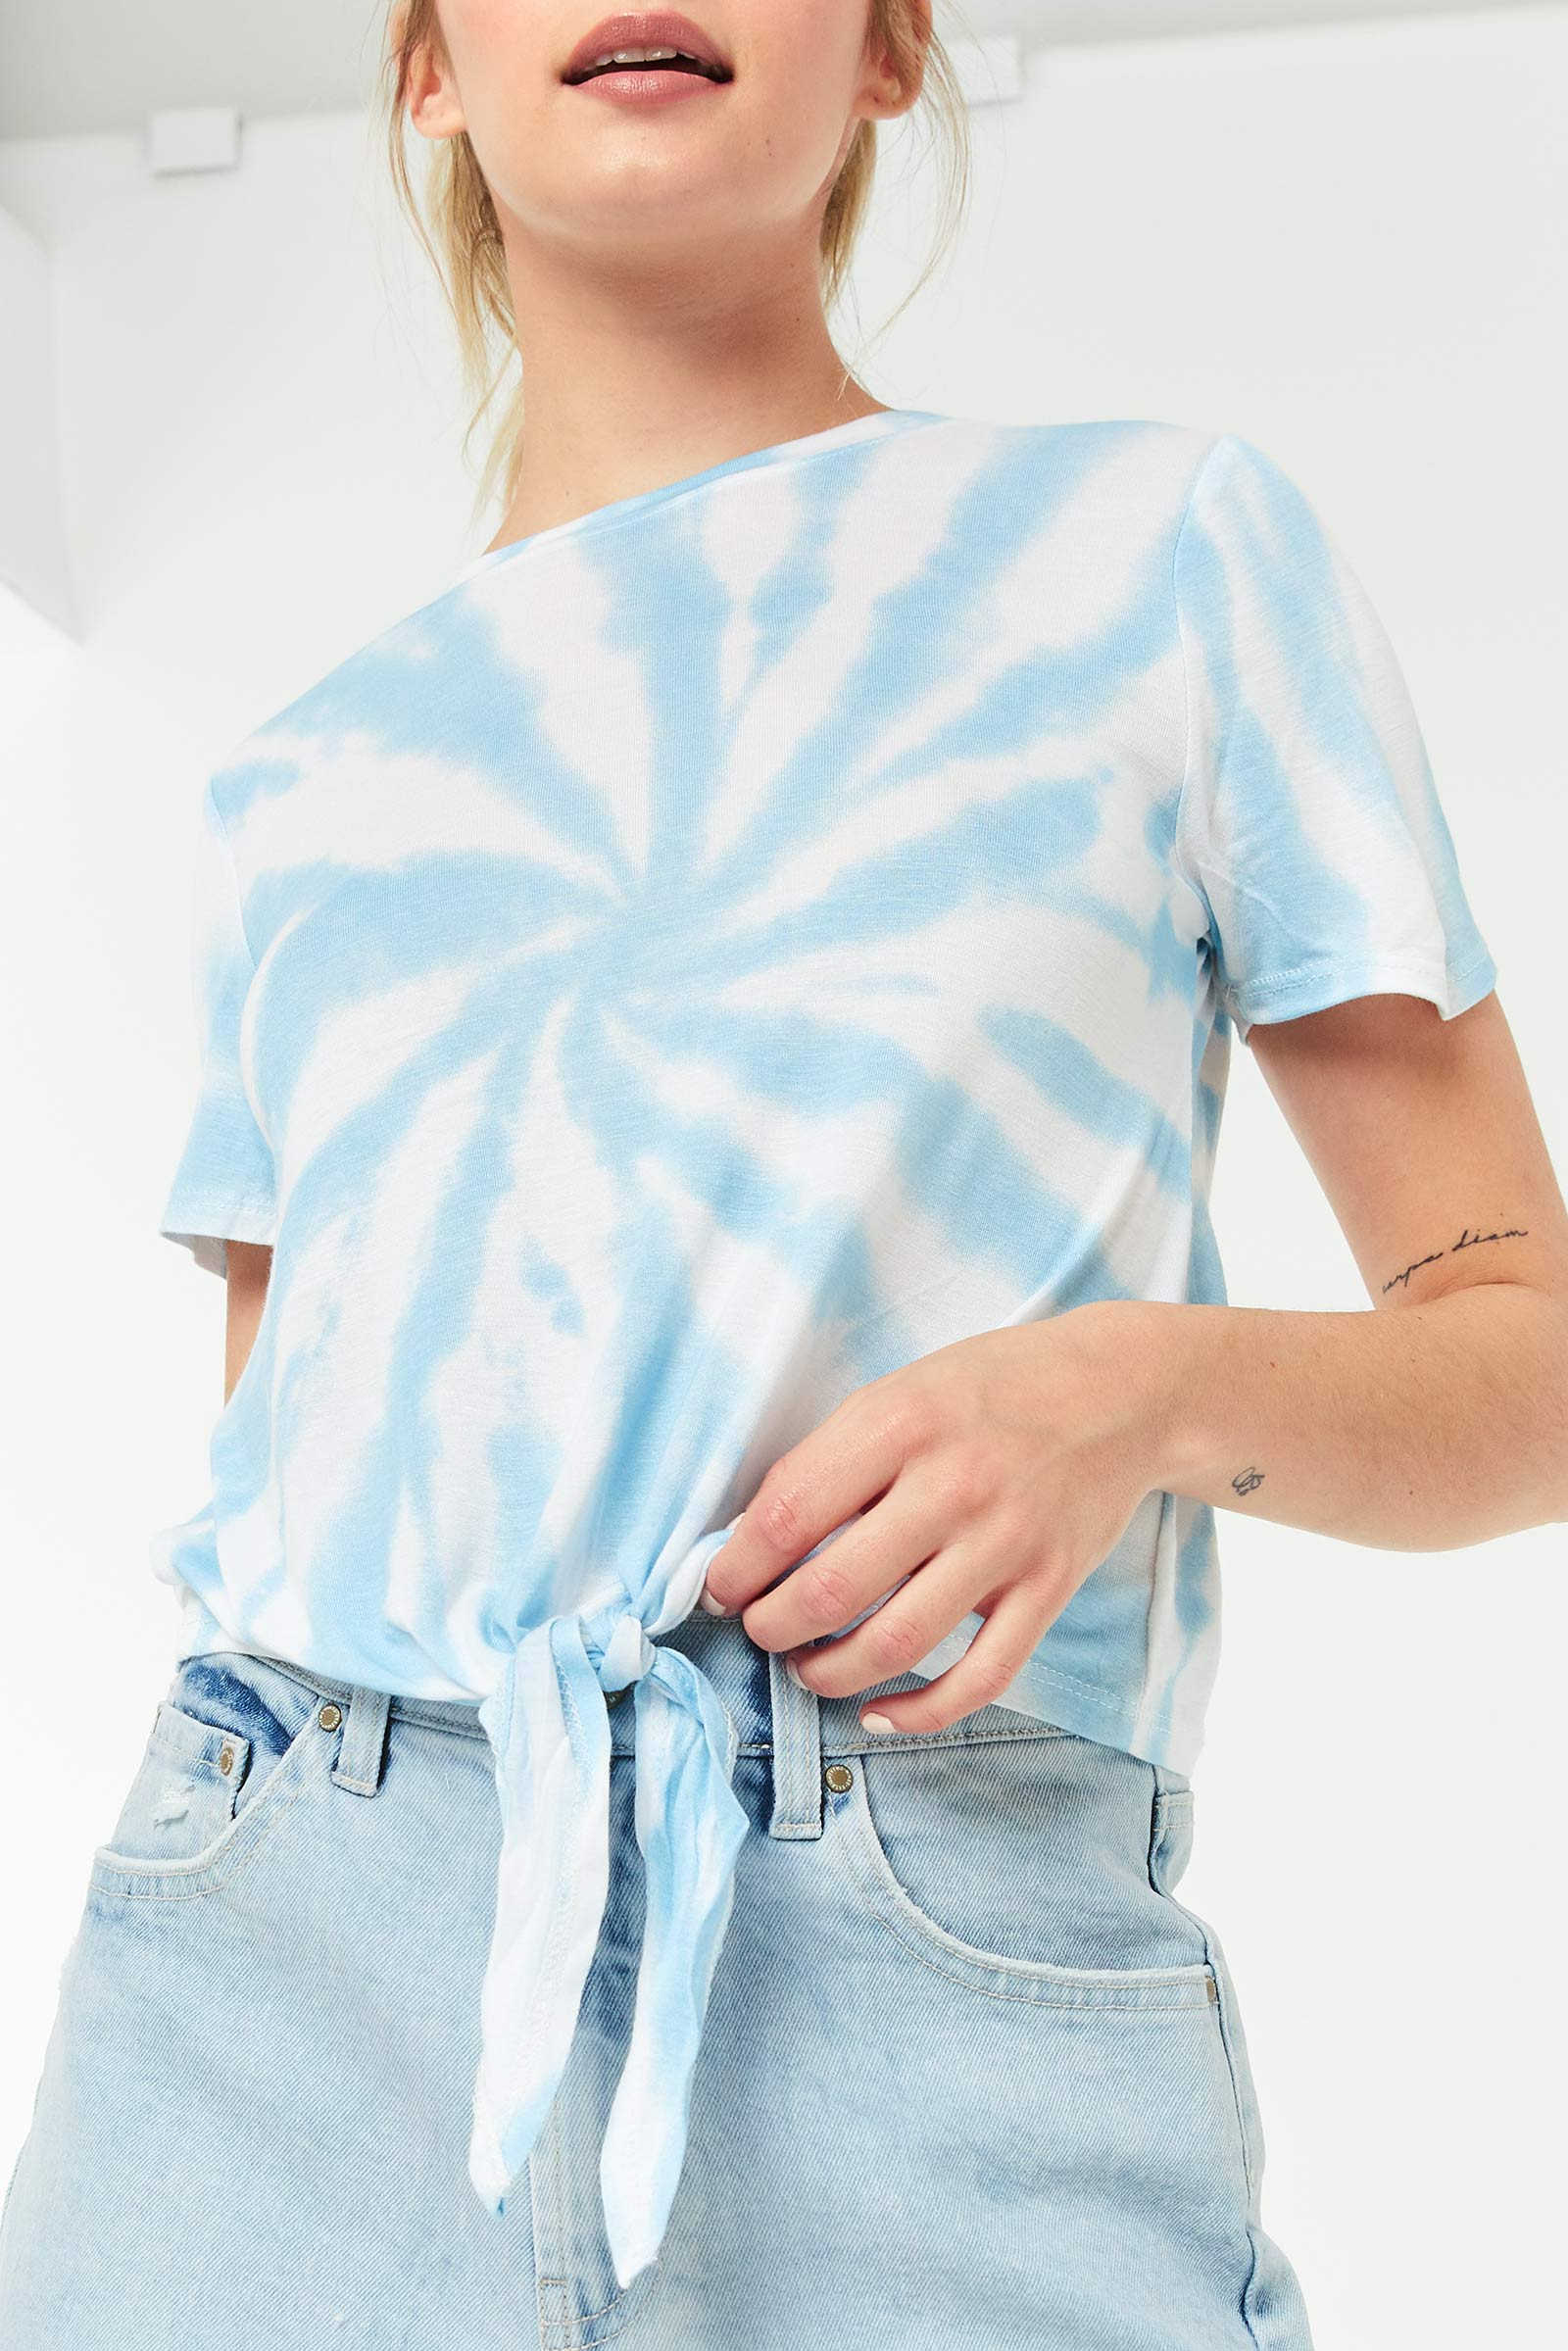 Spiral Tie-Dye Front Tie Top